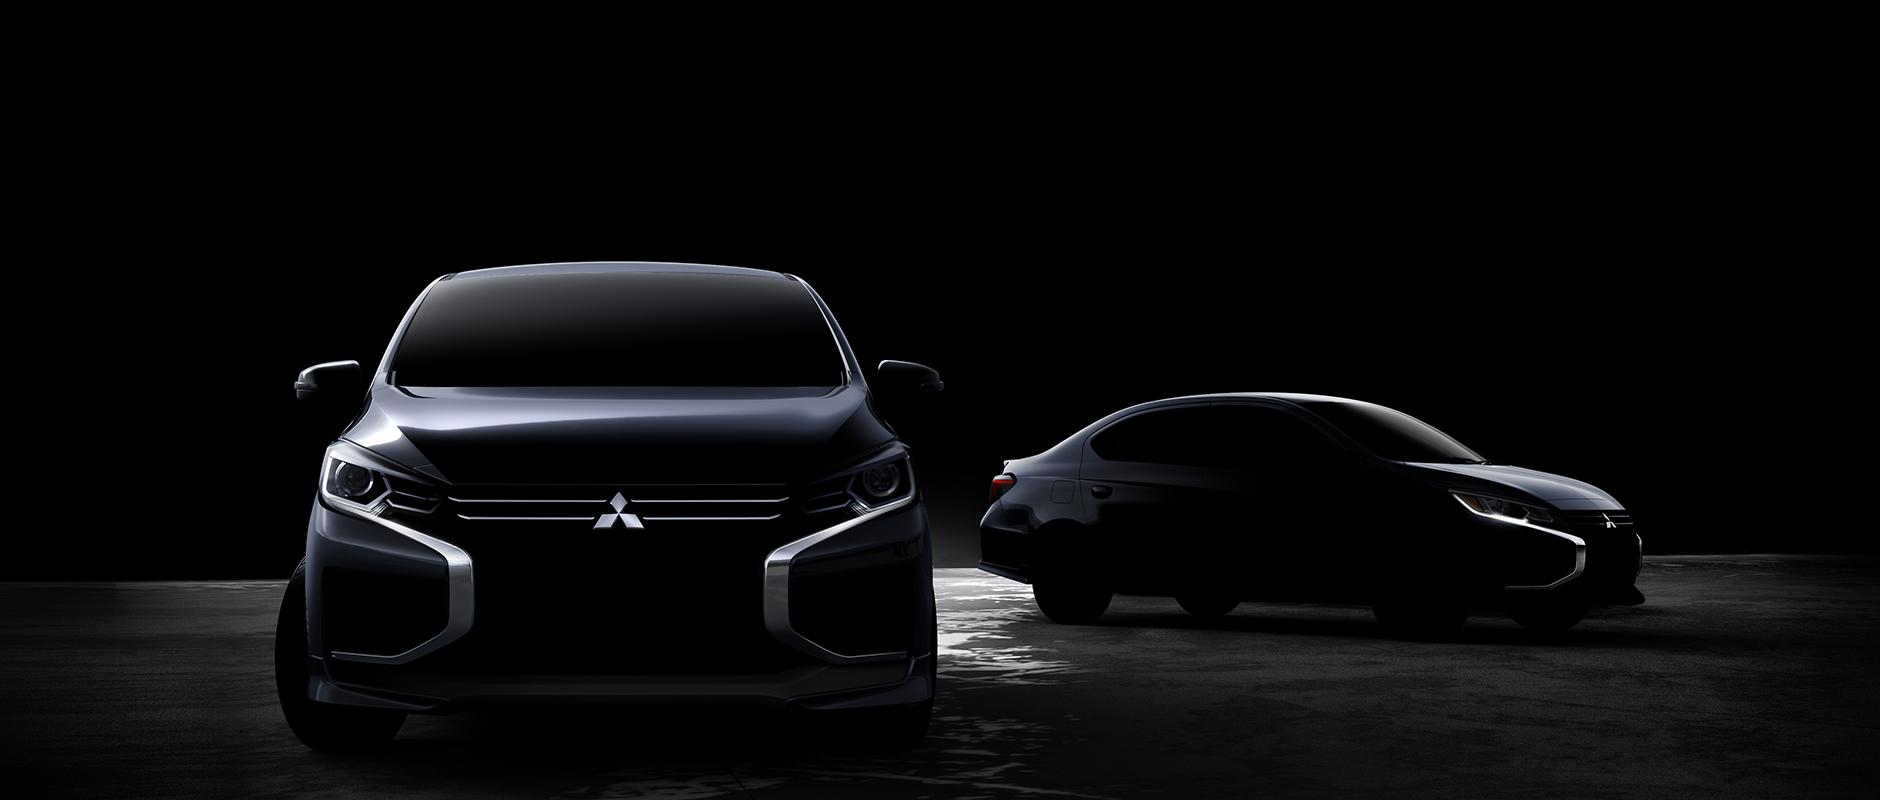 Teaser do facelift do Mitsubishi Space Star